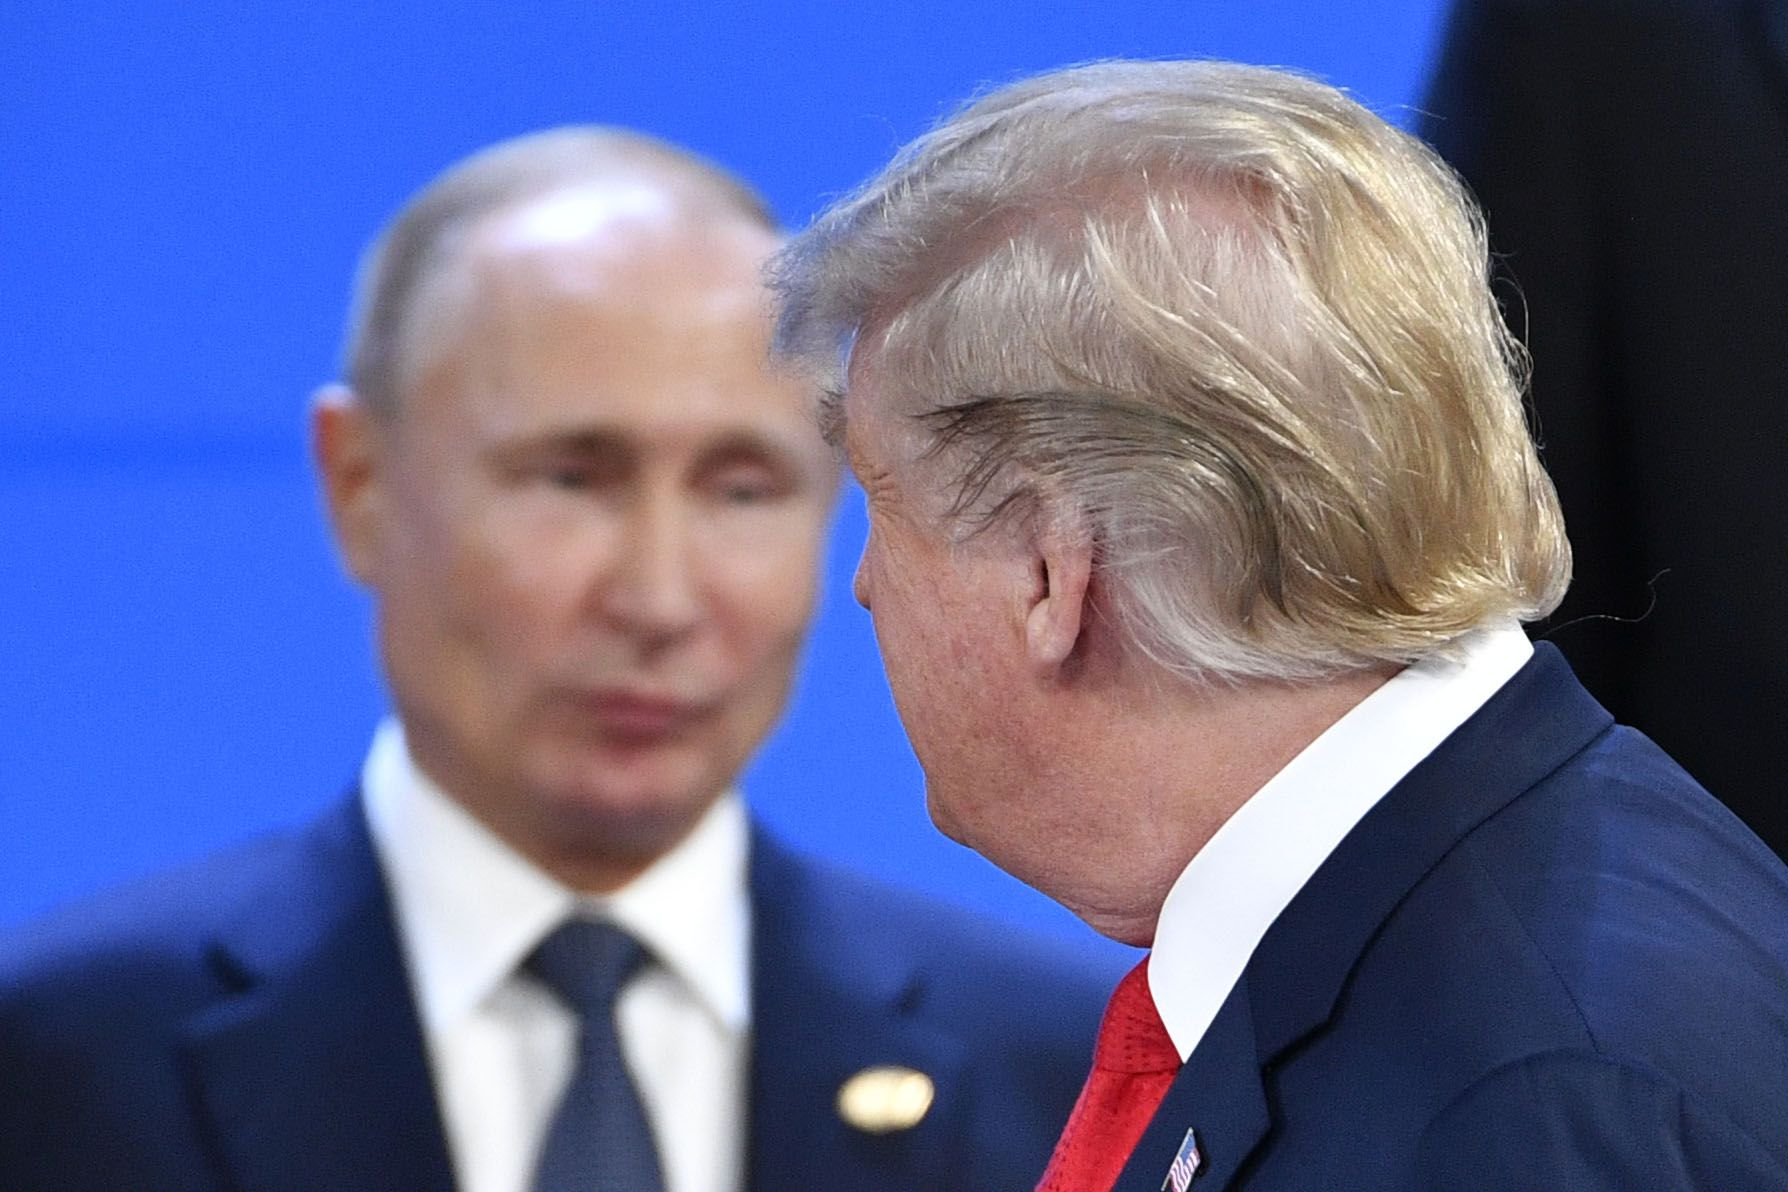 PRESIDENTER: Vladimir Putin og Donald Trump.